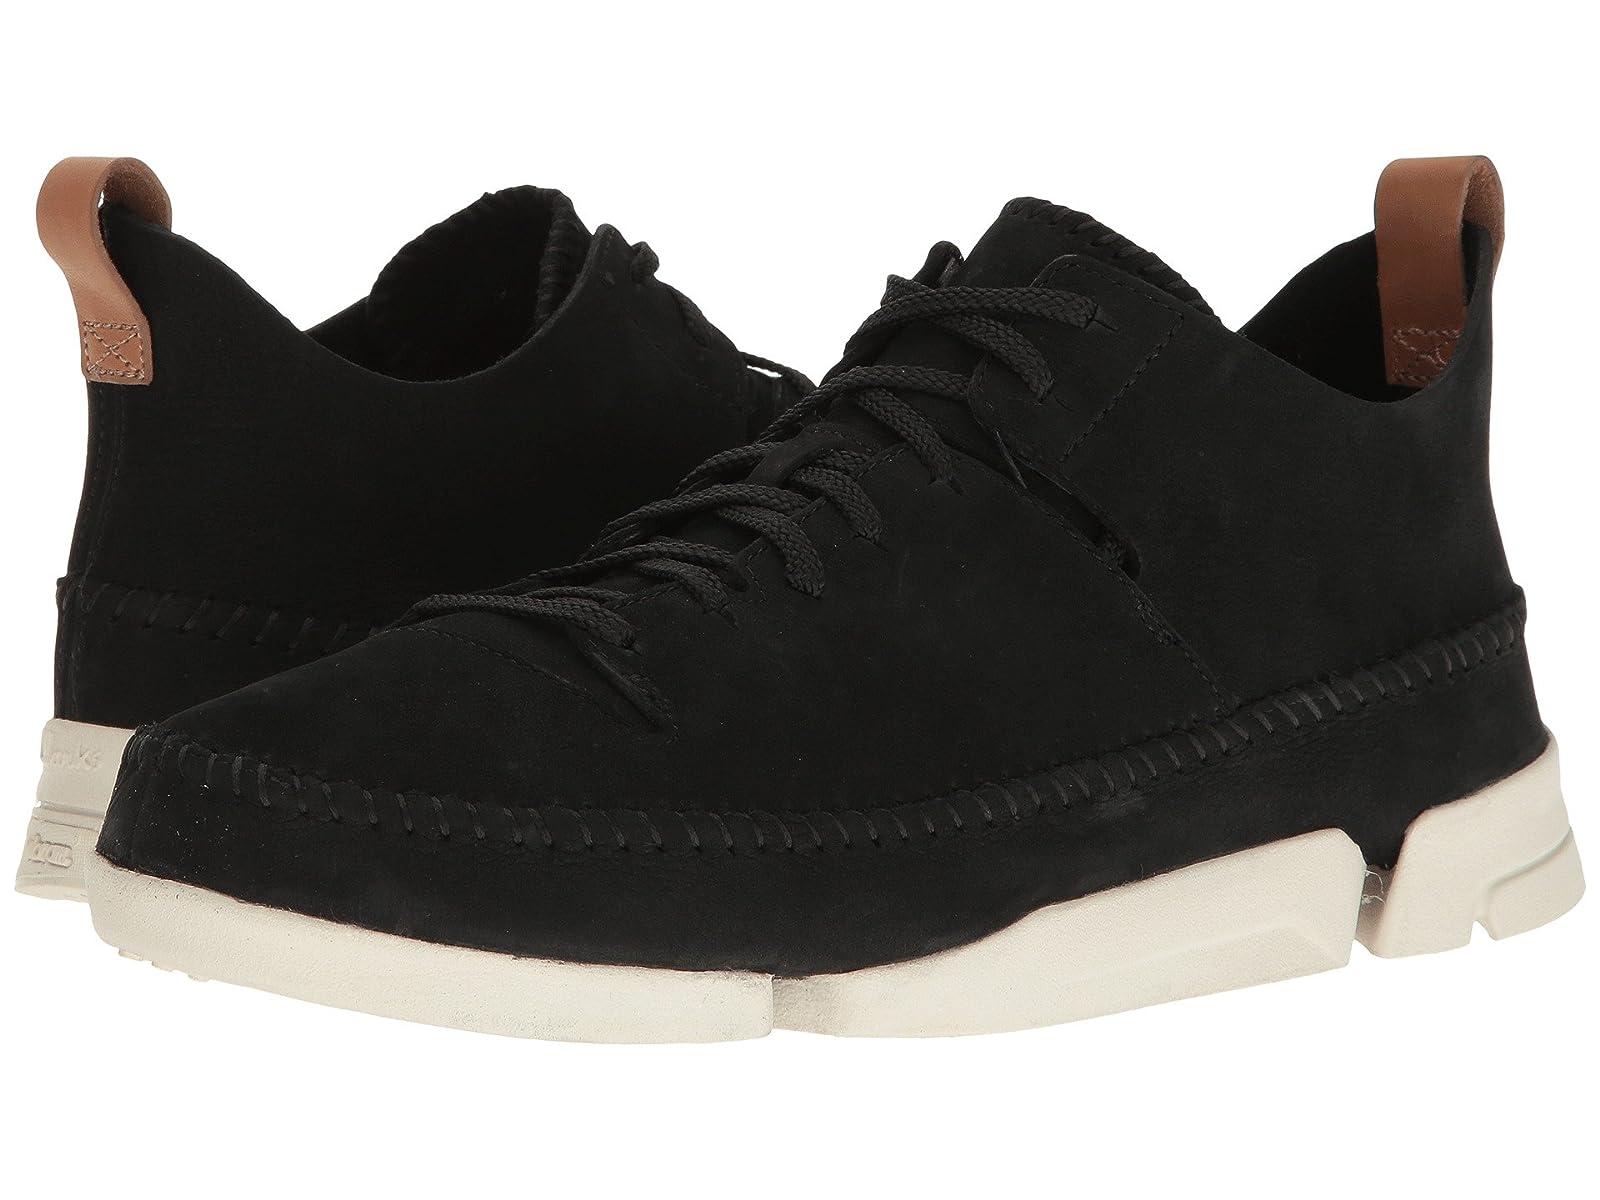 Clarks Trigenic FlexAtmospheric grades have affordable shoes